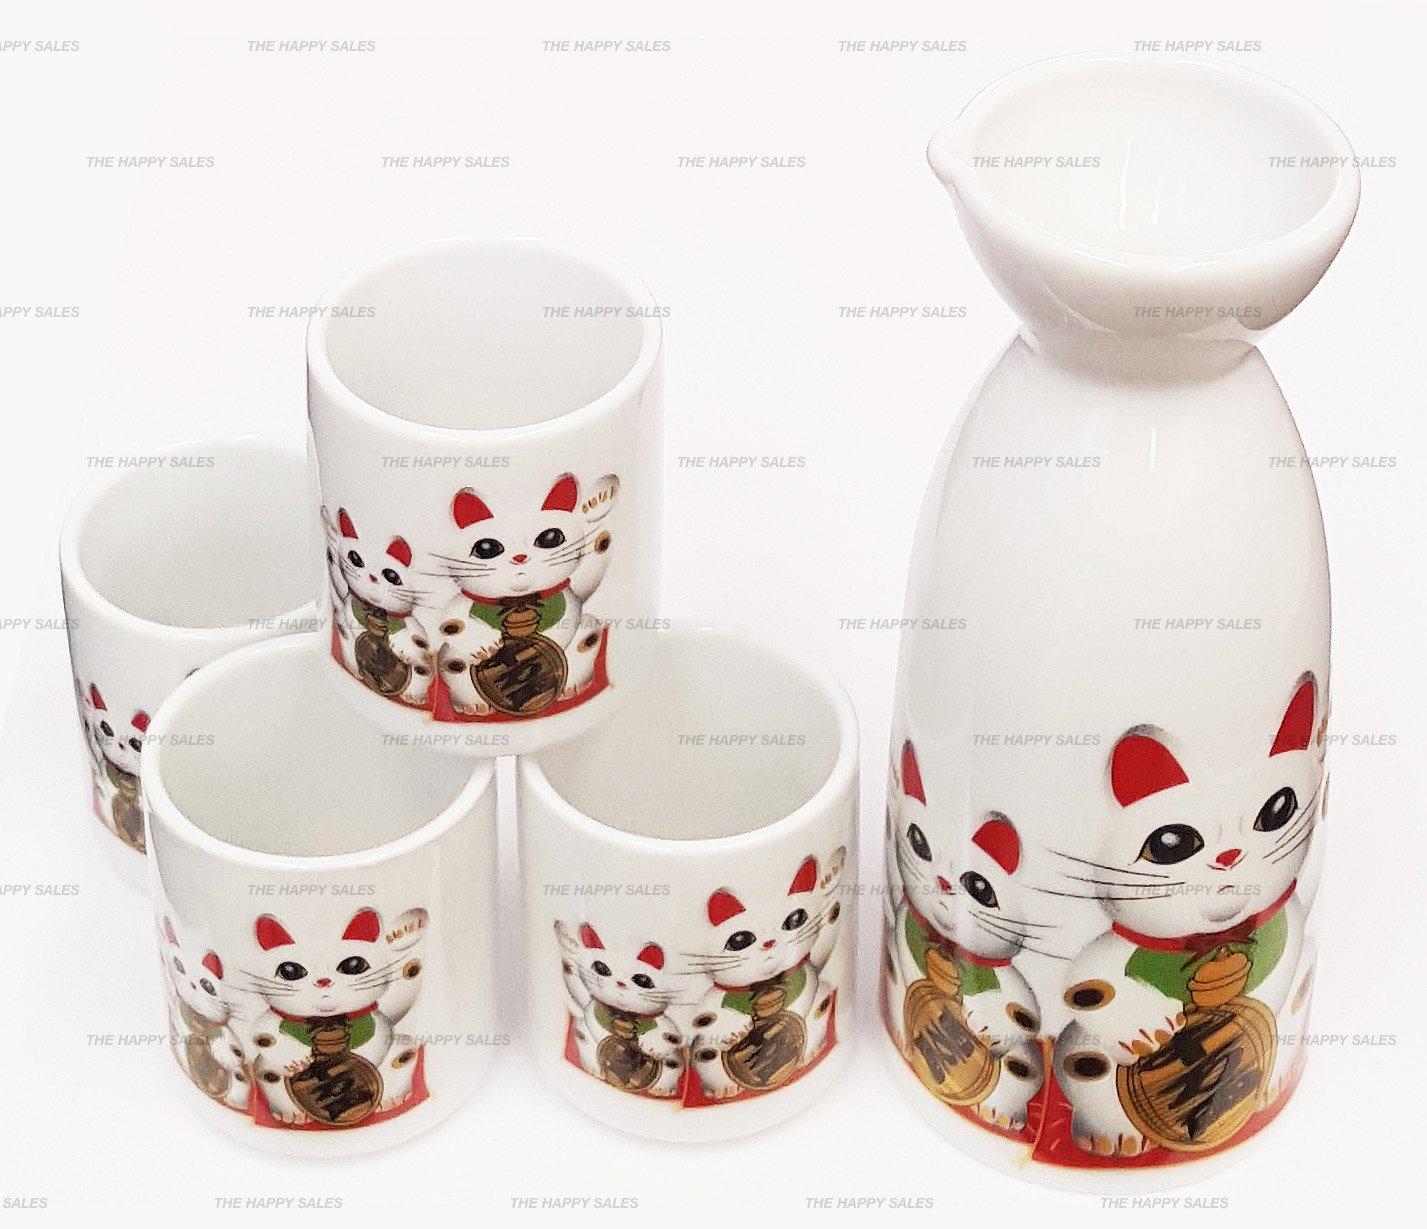 Happy Sales Fortune Cat Maneki Lucky Neko Japanese Sake Set, Maneki Lucky Cat